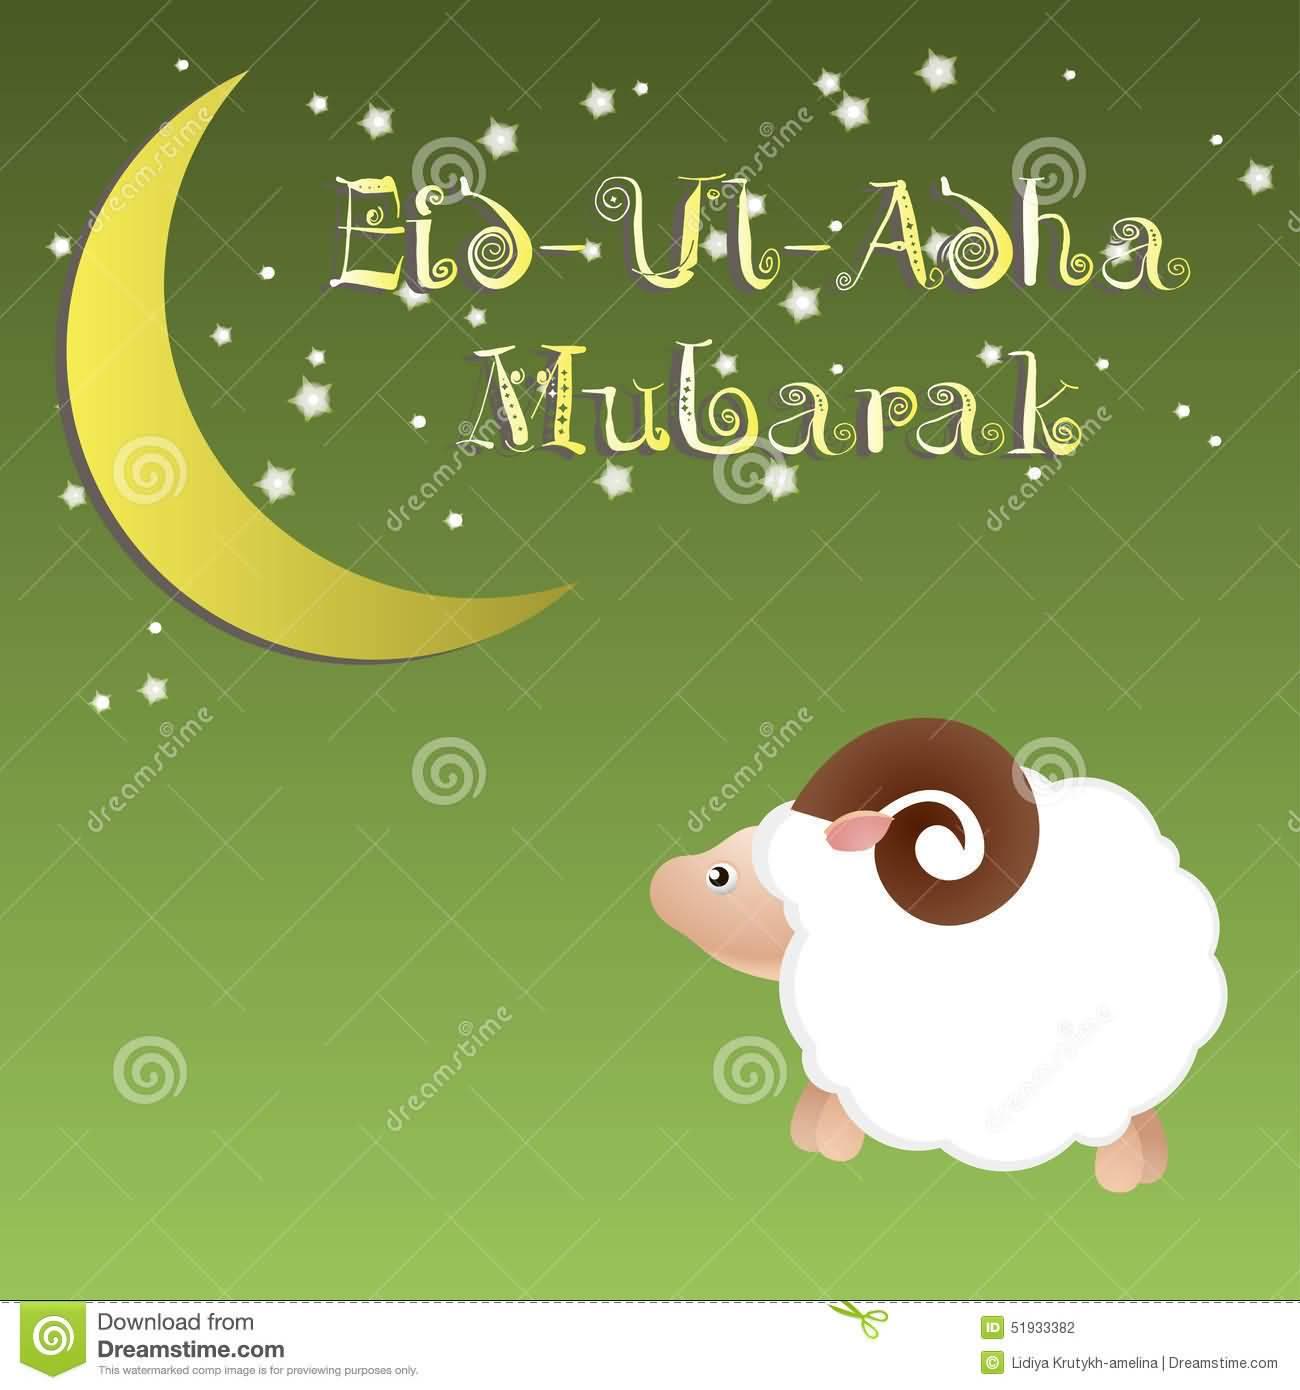 best greeting photos. 2016 clipart eid ul adha